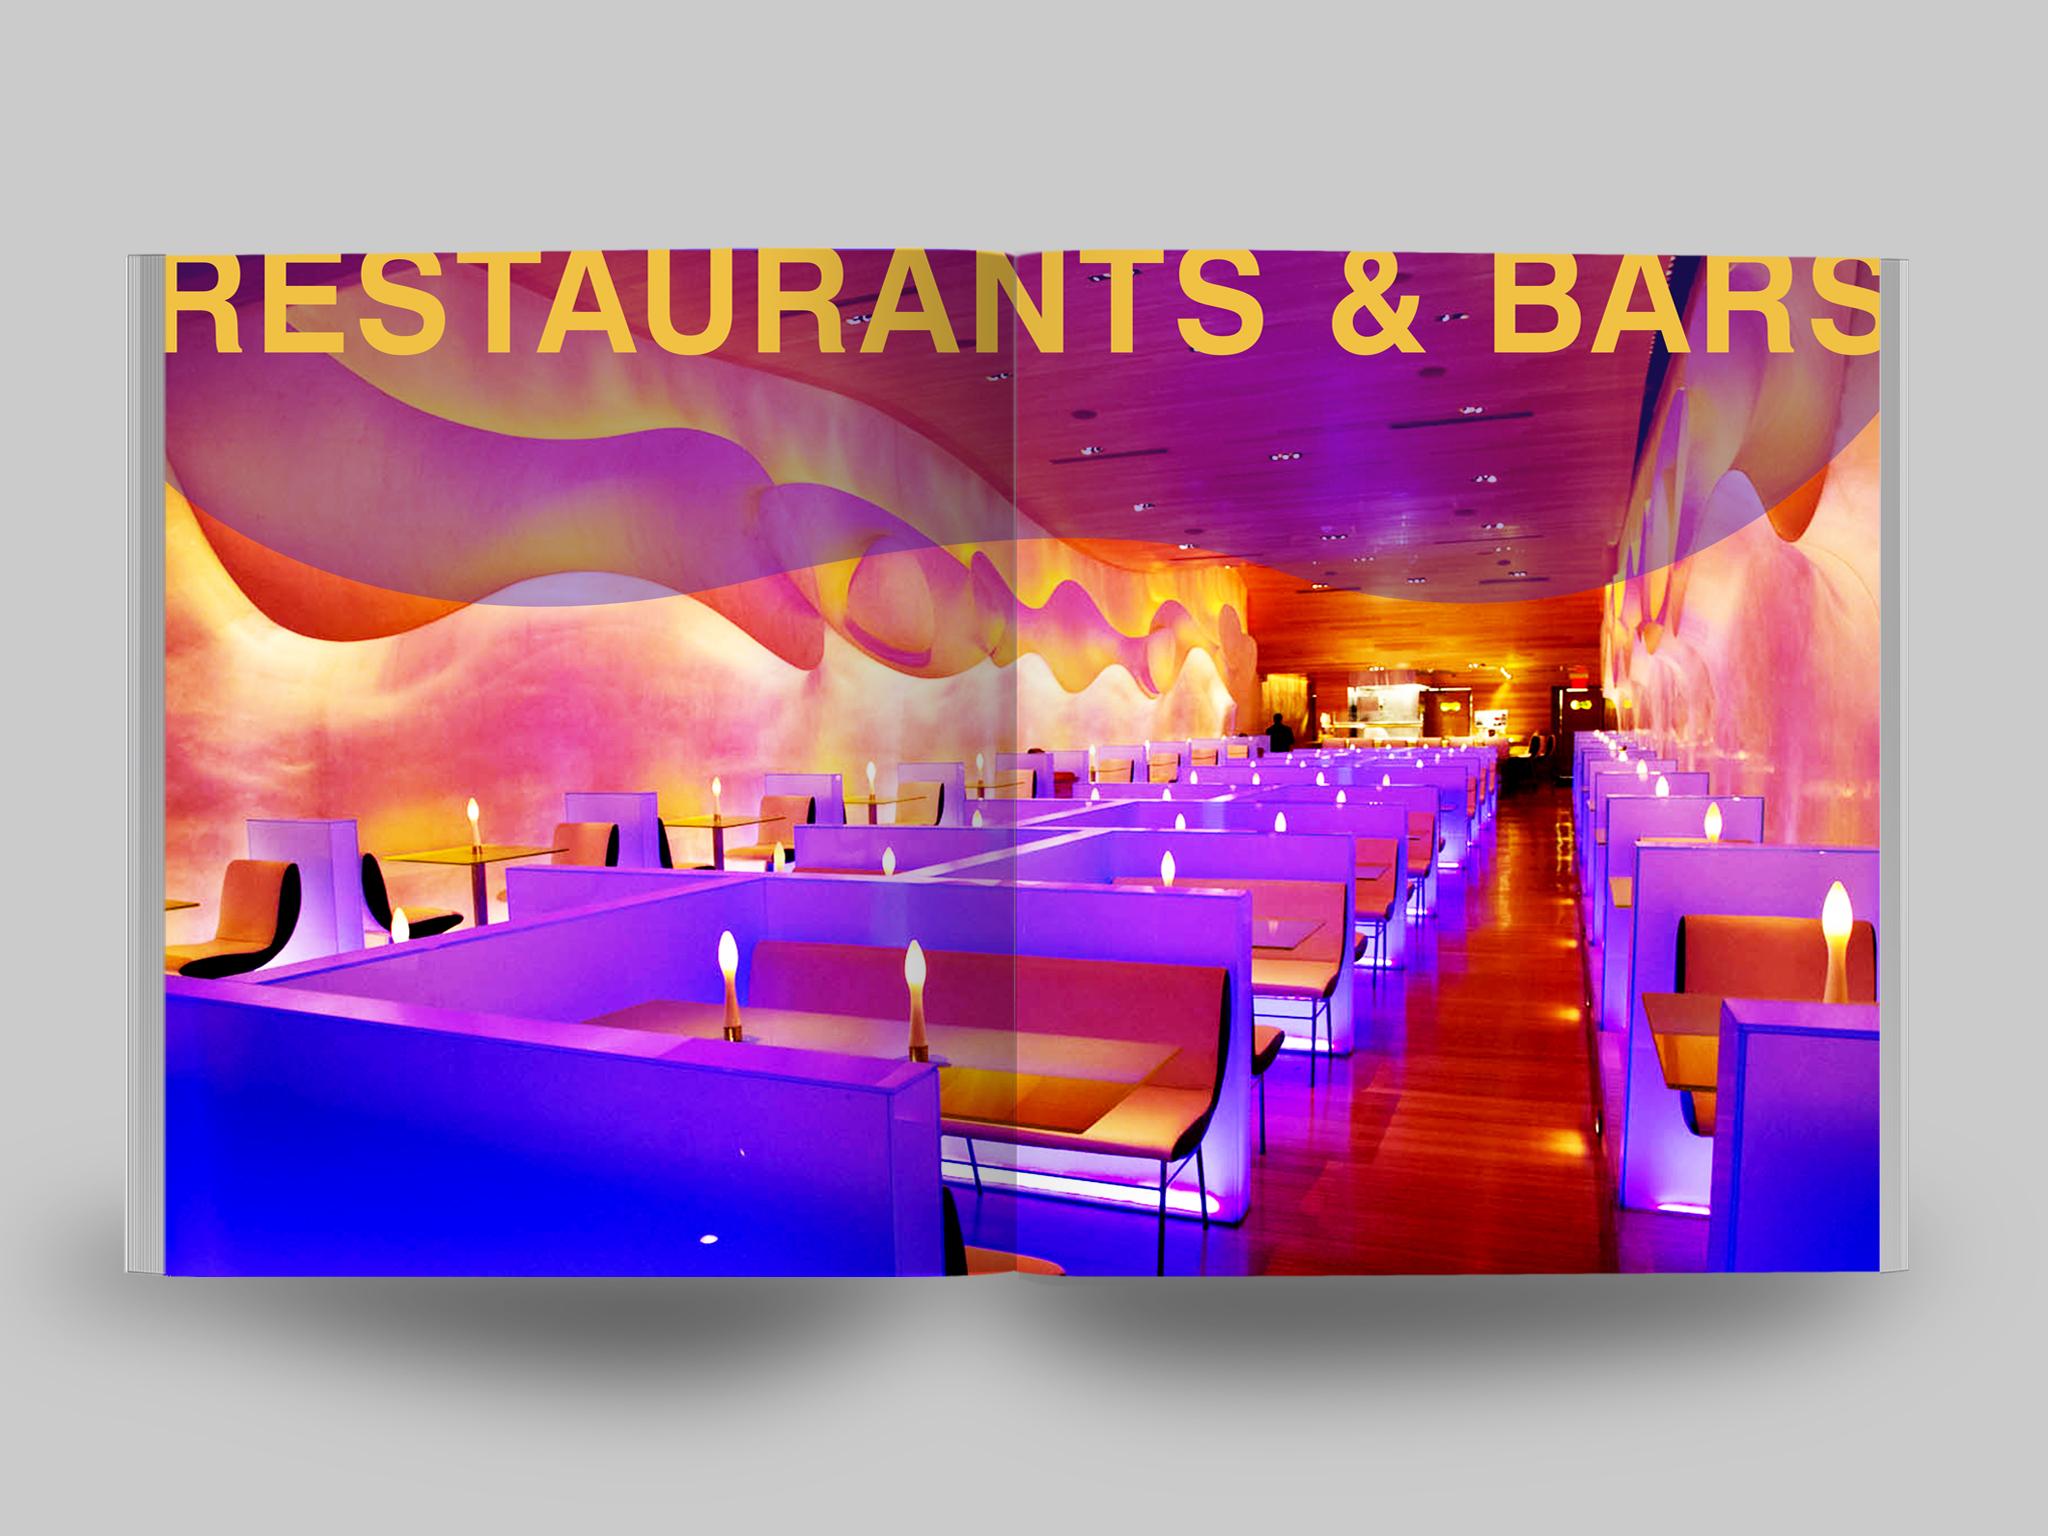 karimrashidspreadrestaurantsbars.jpg